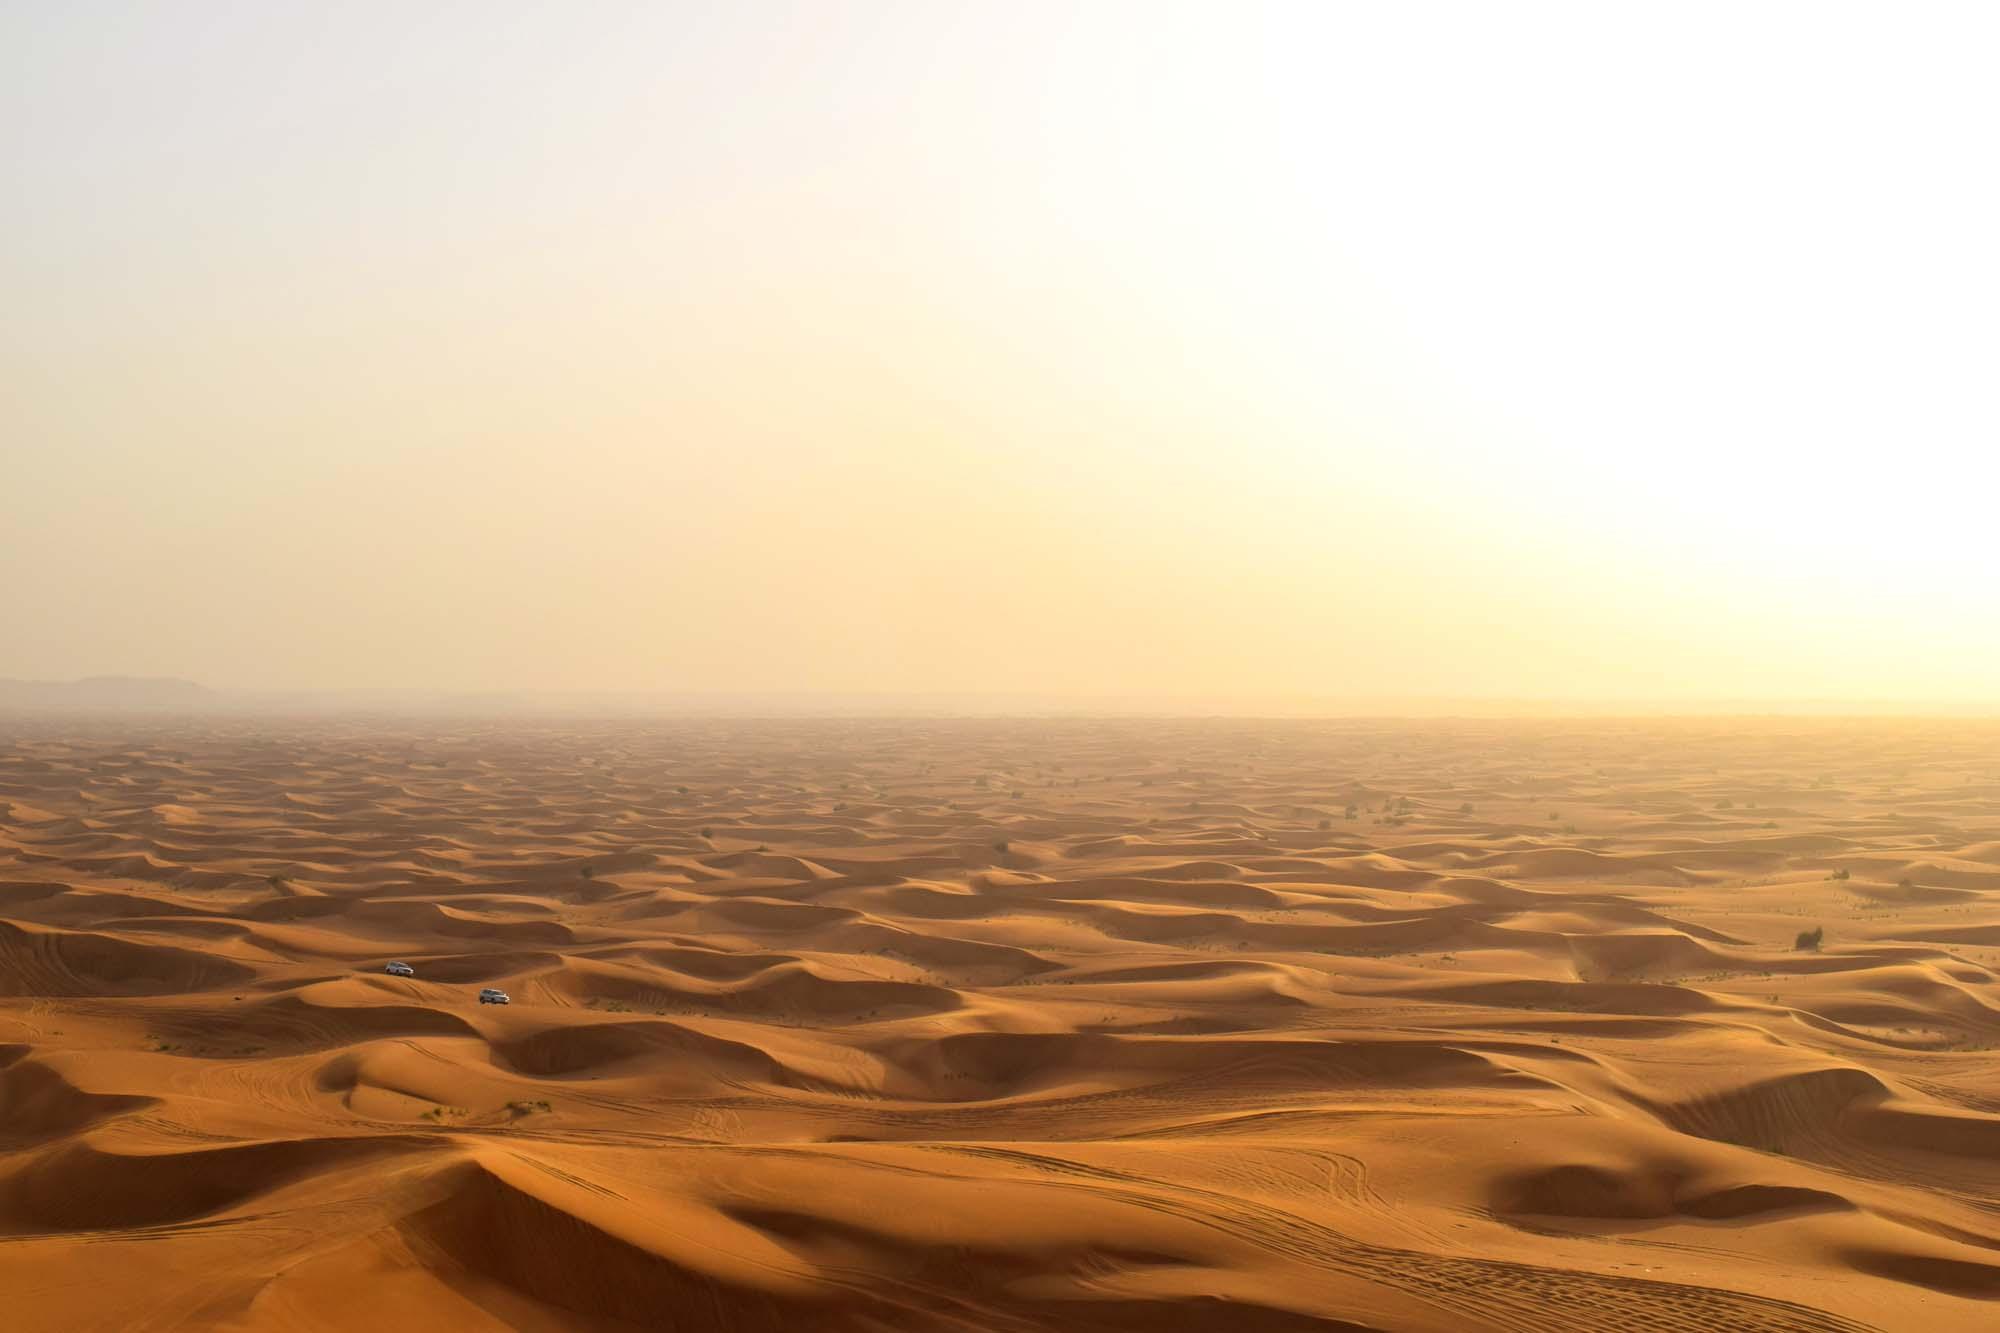 dune safari in the arabian desert